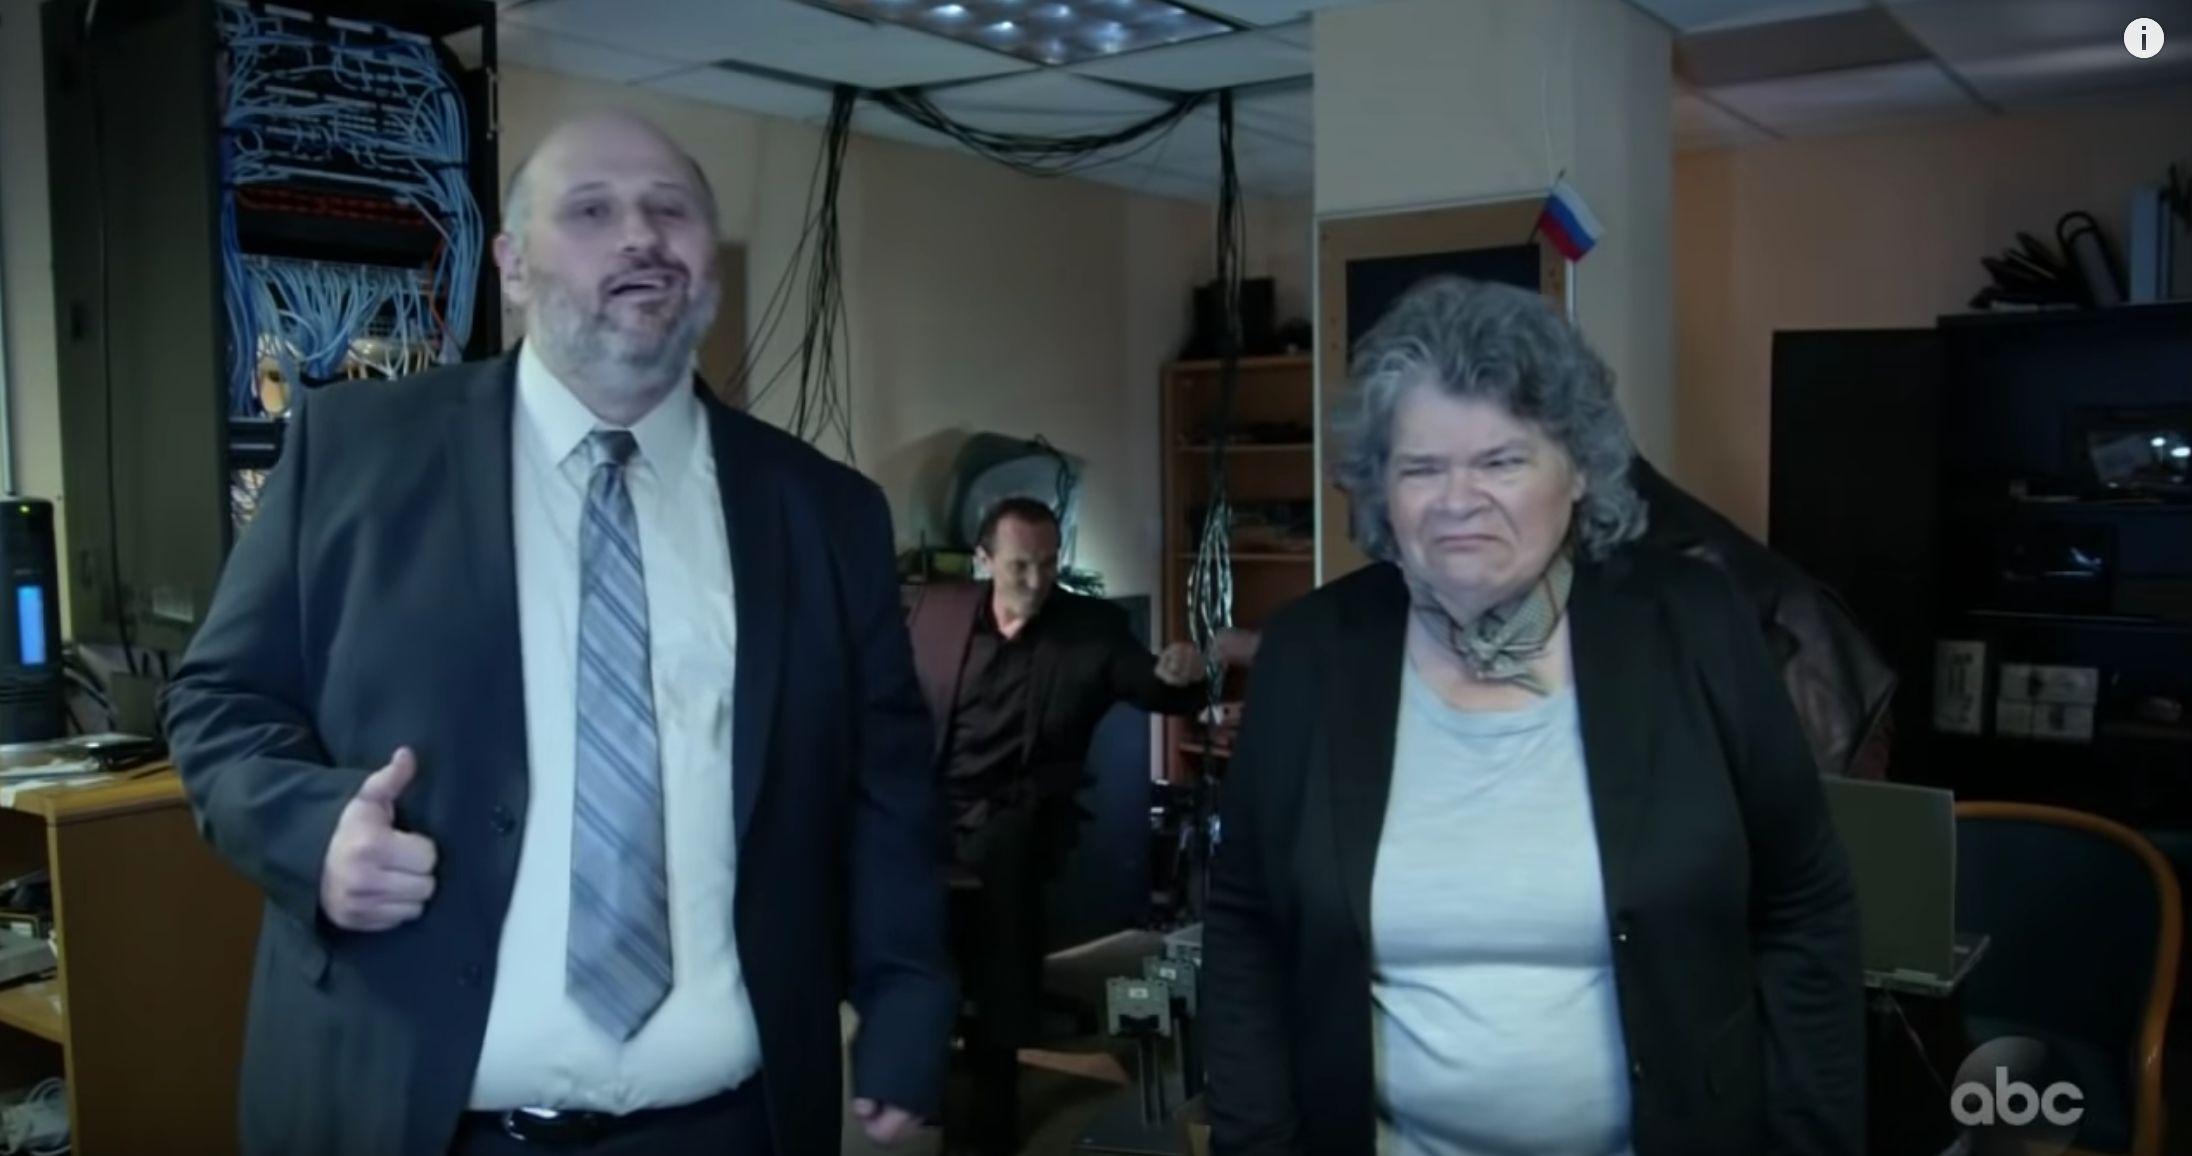 Jimmy Kimmel Imagines Russian Troll Farm Training Video And It's Way Too